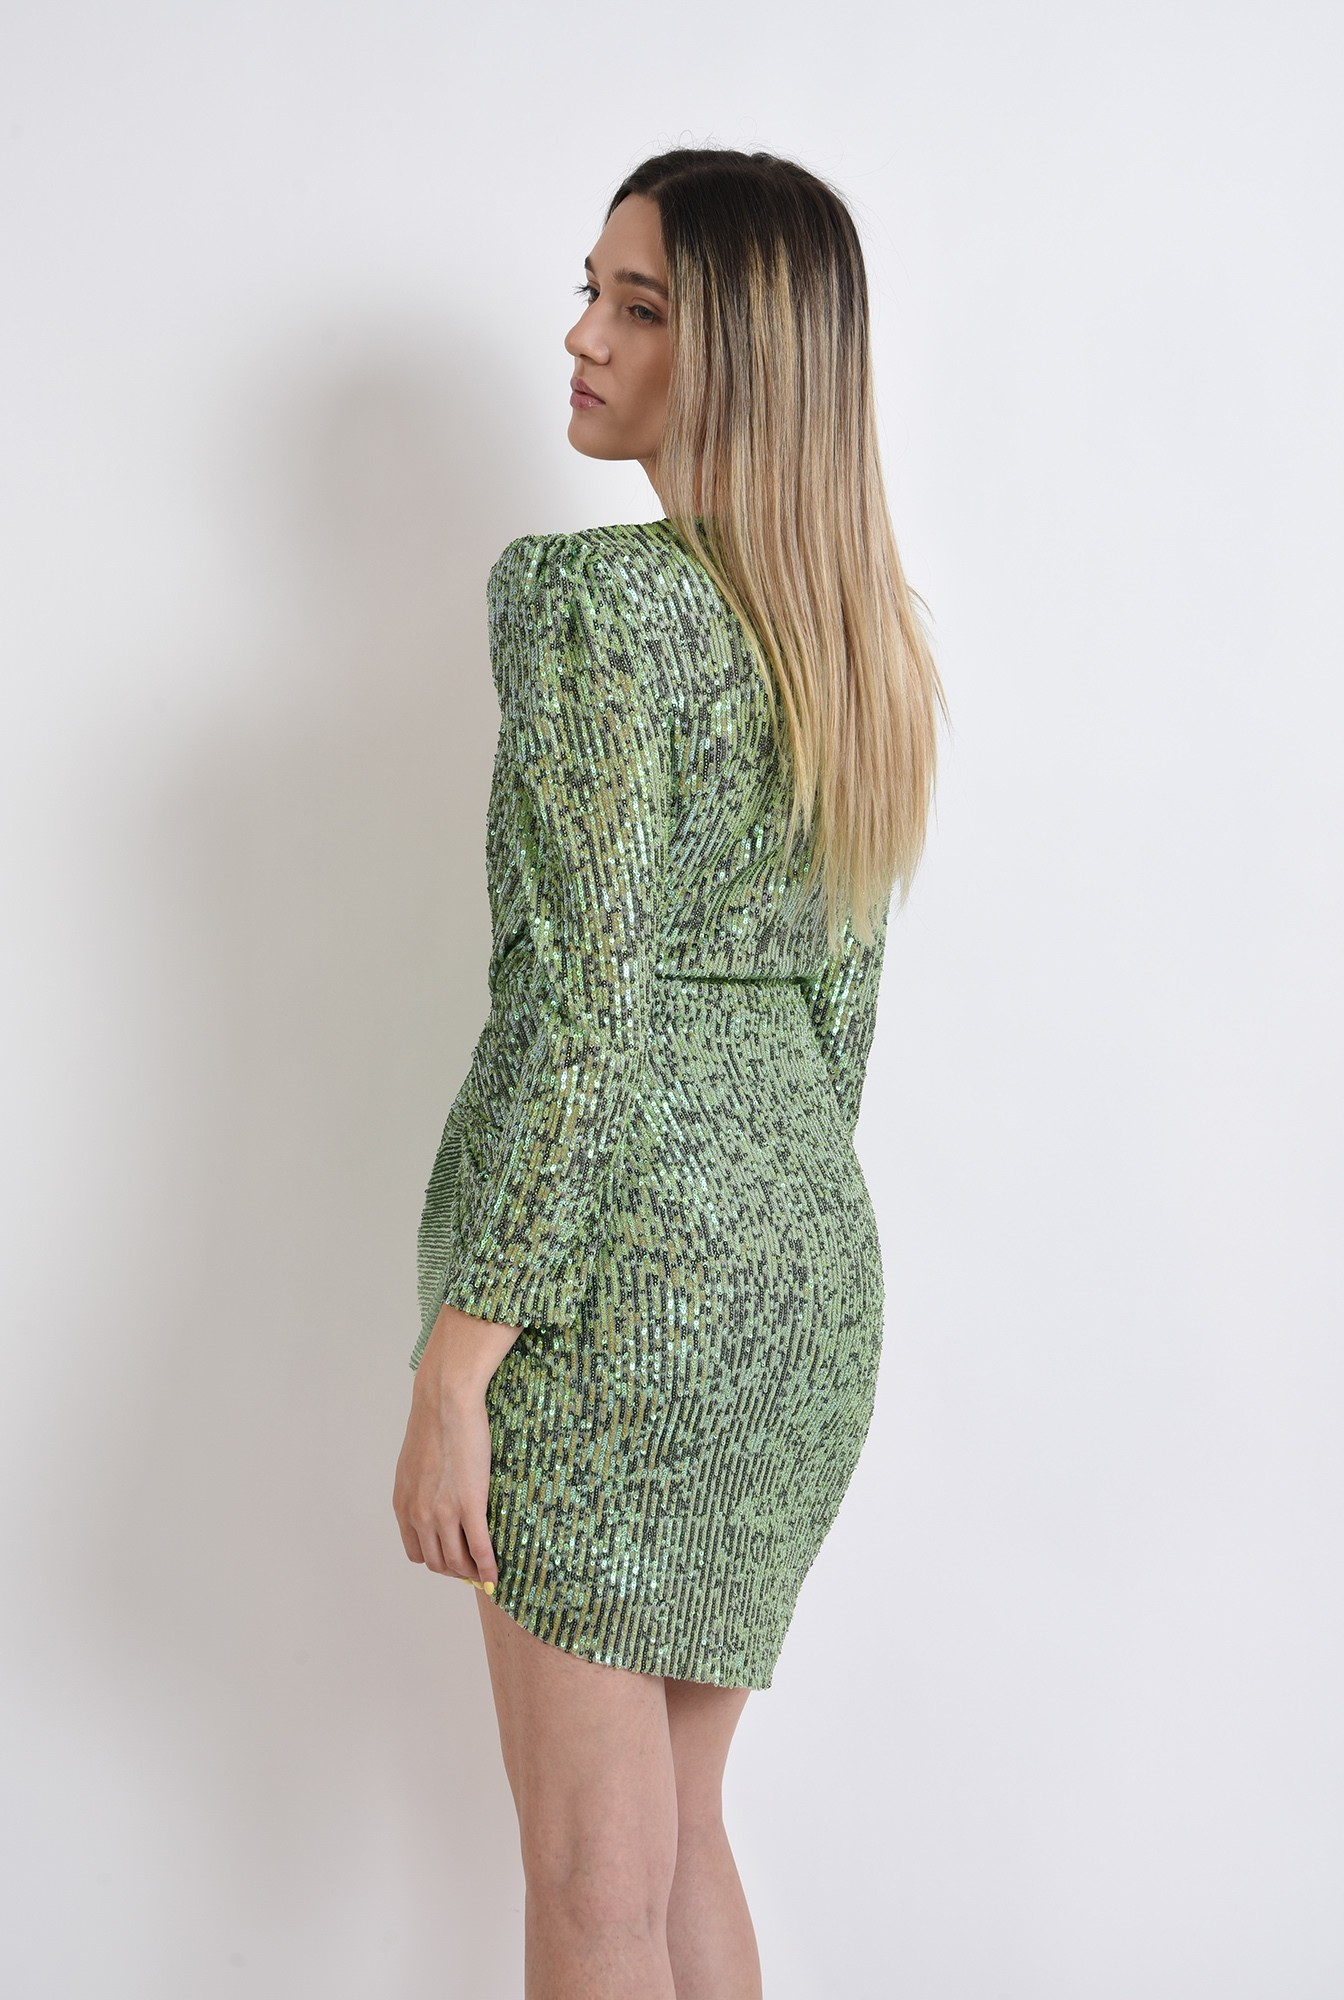 2 - rochie scurta, eleganta, paiete, decolteu adanc, verde